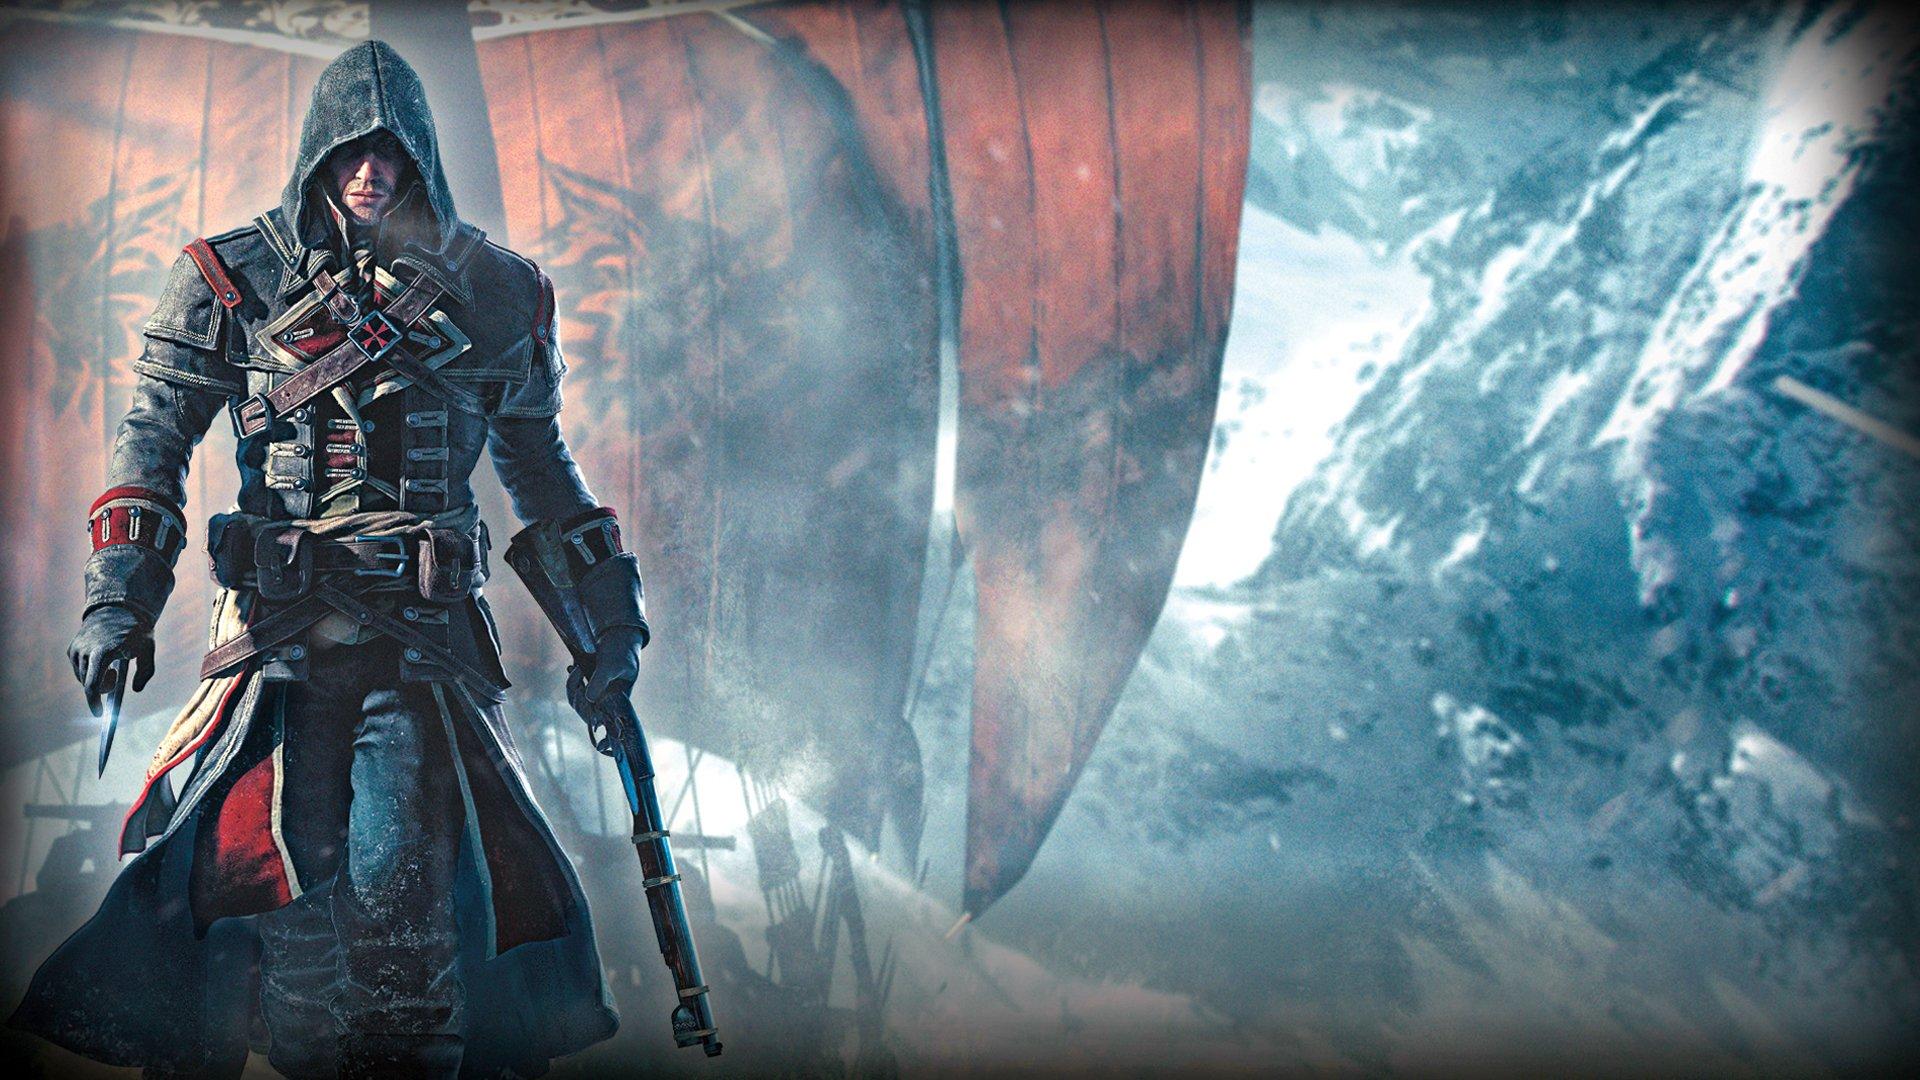 5. Assassin's Creed Rogue